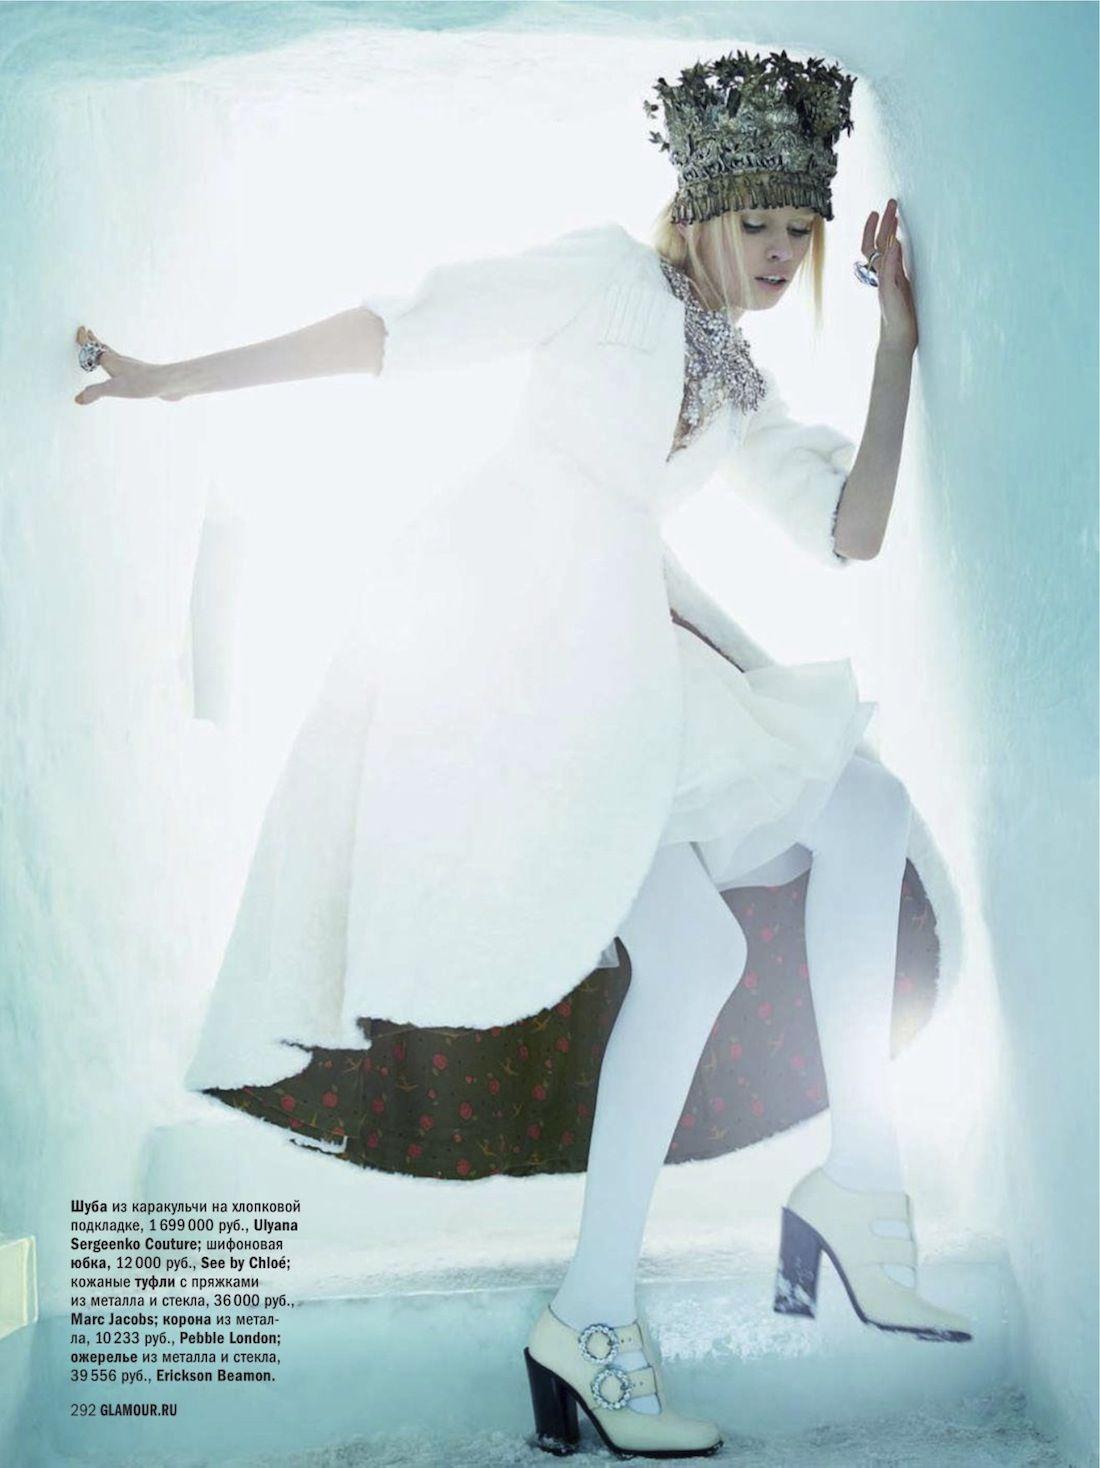 Glamour Russia December 2012  Model: Masha Kirsanova Photographer: Henrik Halvarsson  Stylist: Oksana On